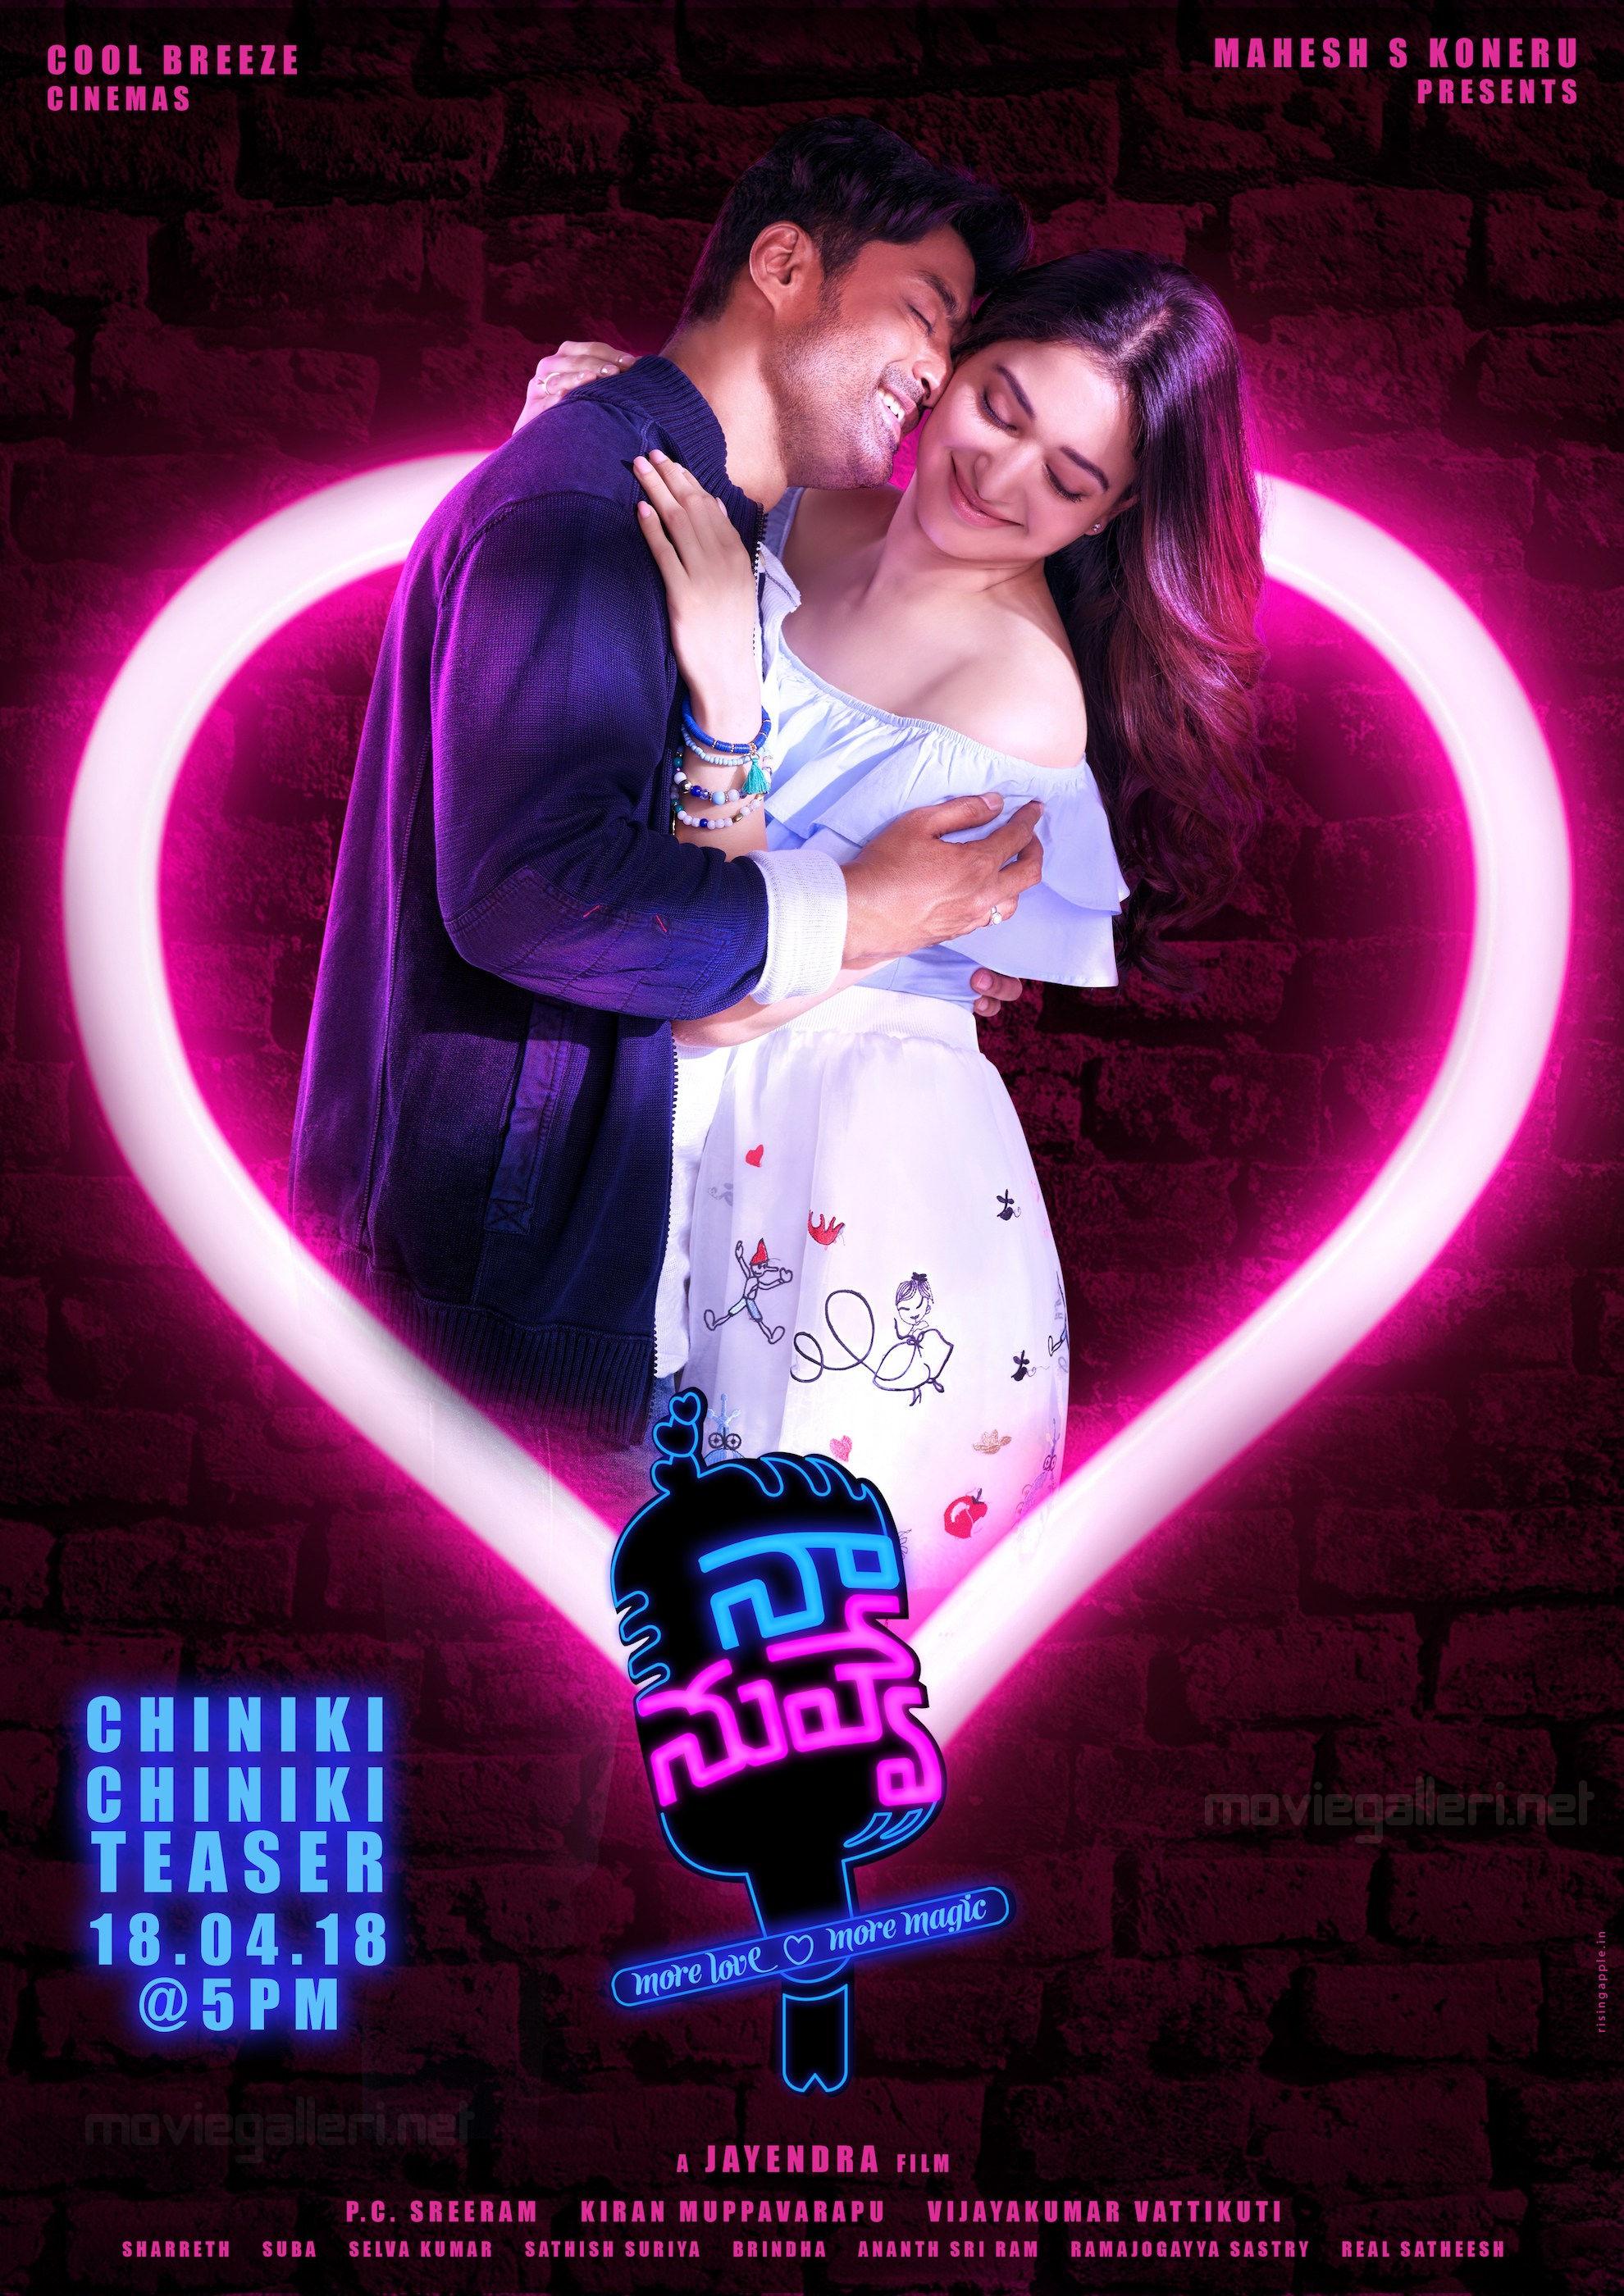 Kalyan Ram Tamanna Naa Nuvve Movie Chiniki Chiniki Teaser Releasing on April 18th Poster HD